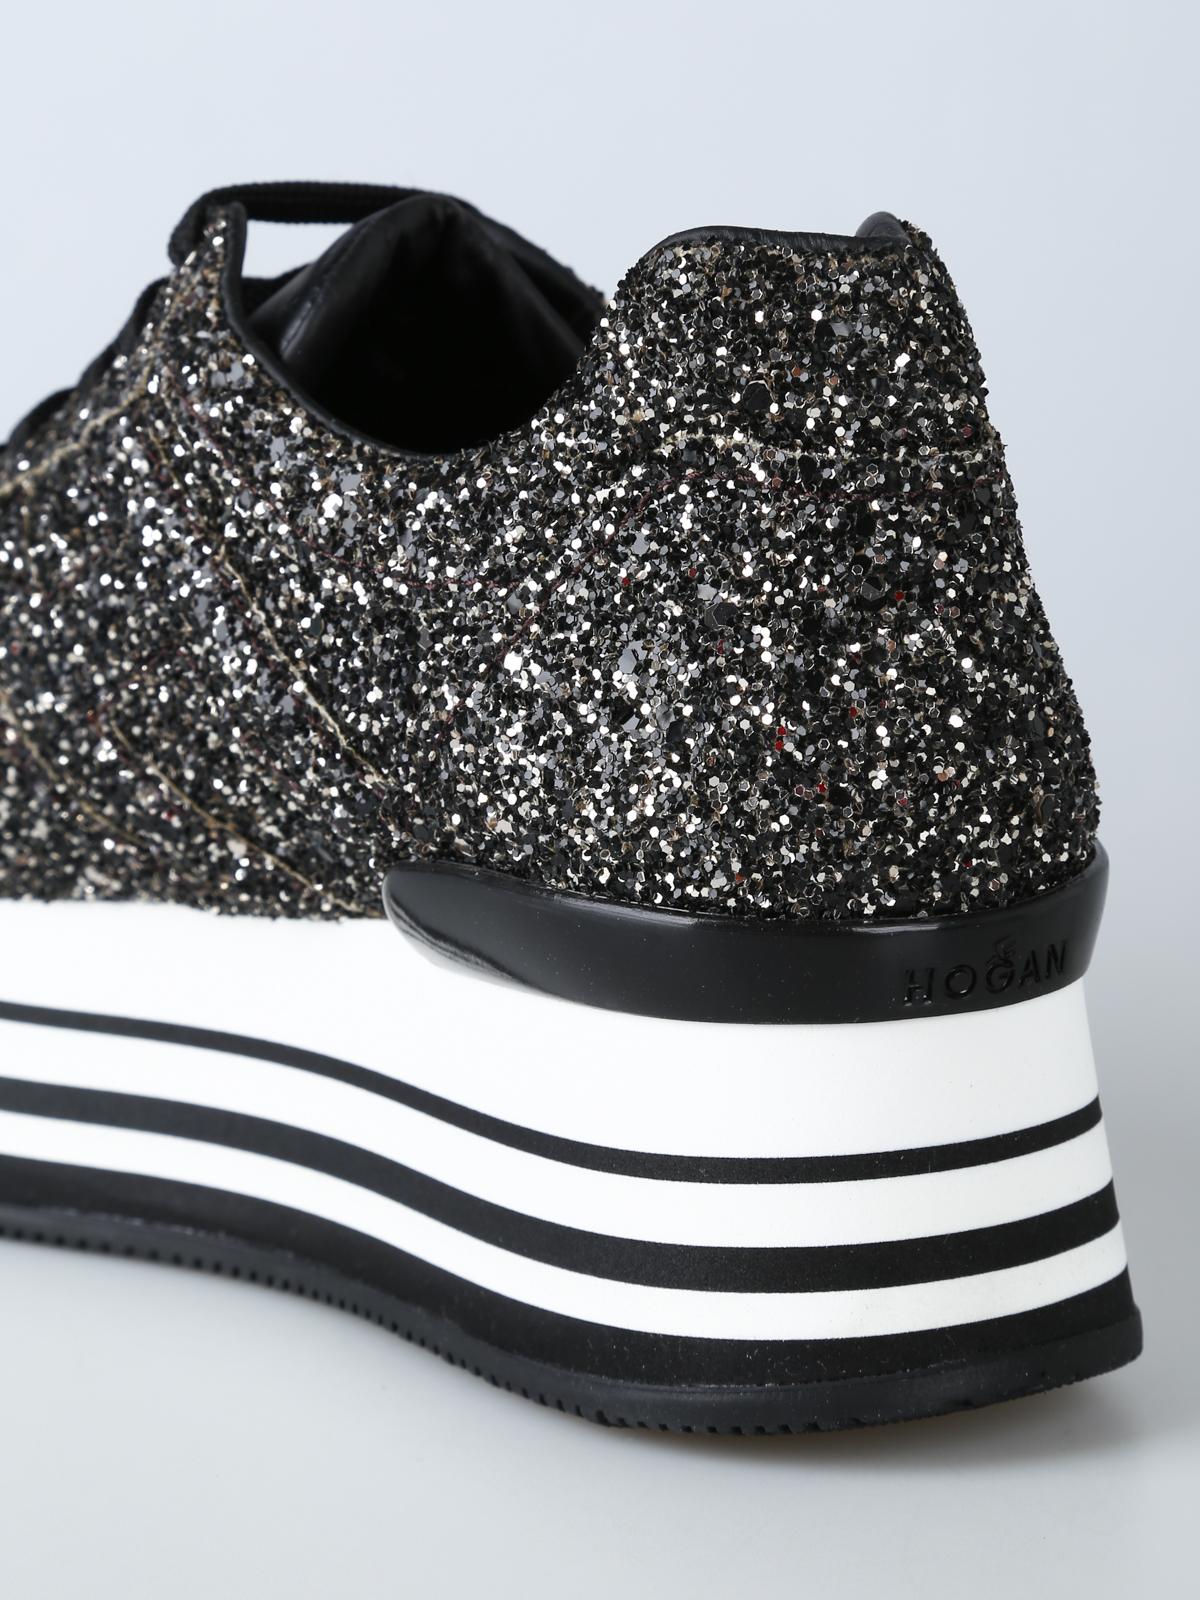 Trainers Hogan - Coarse glitter H222 maxi platform sneakers ...